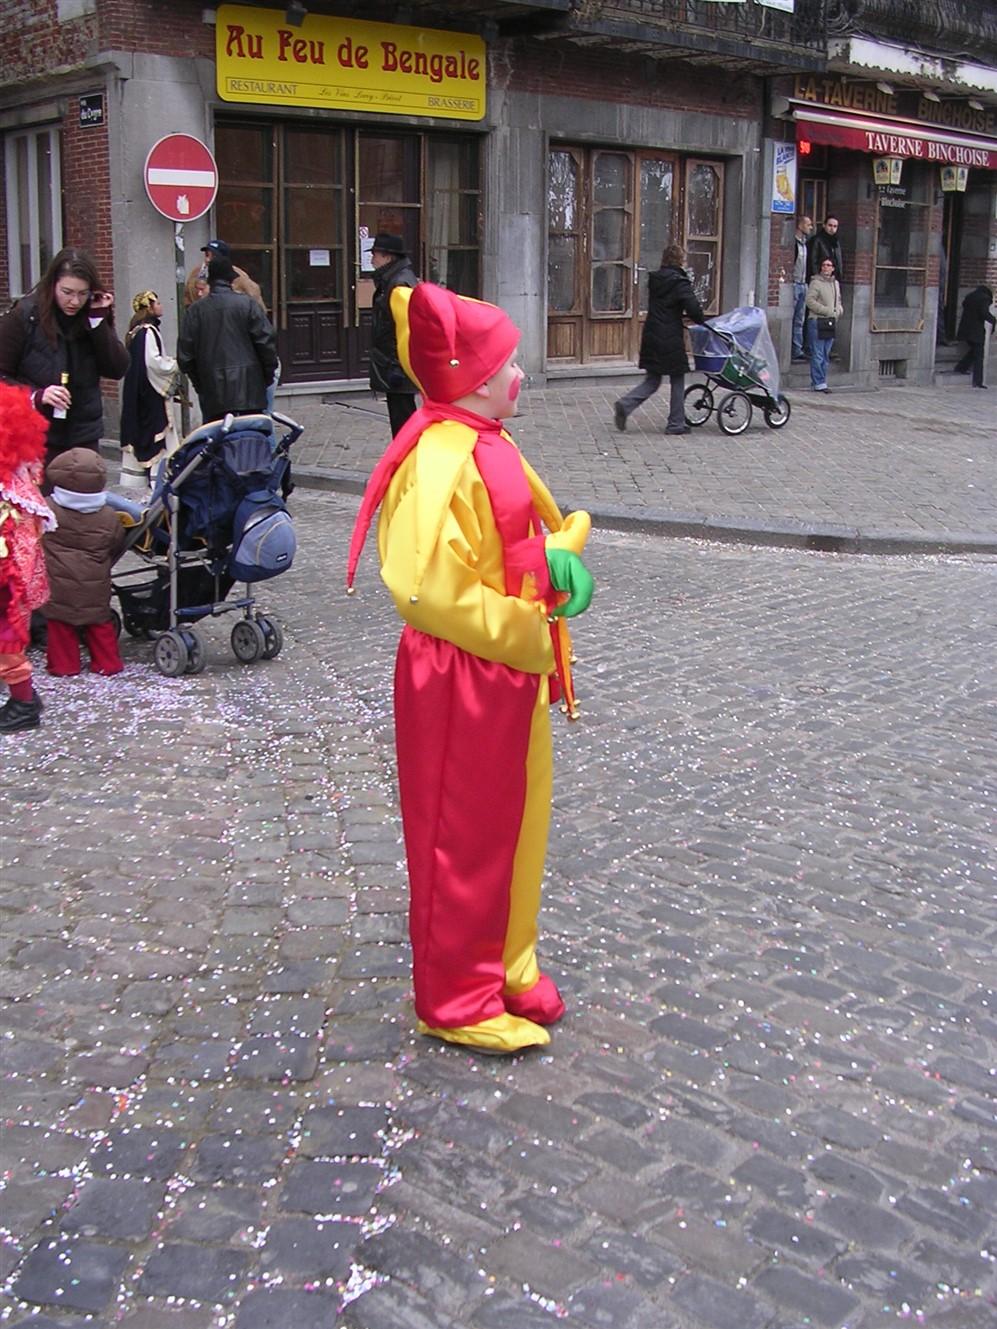 2006 02 26 Binche Belgium 15.jpg